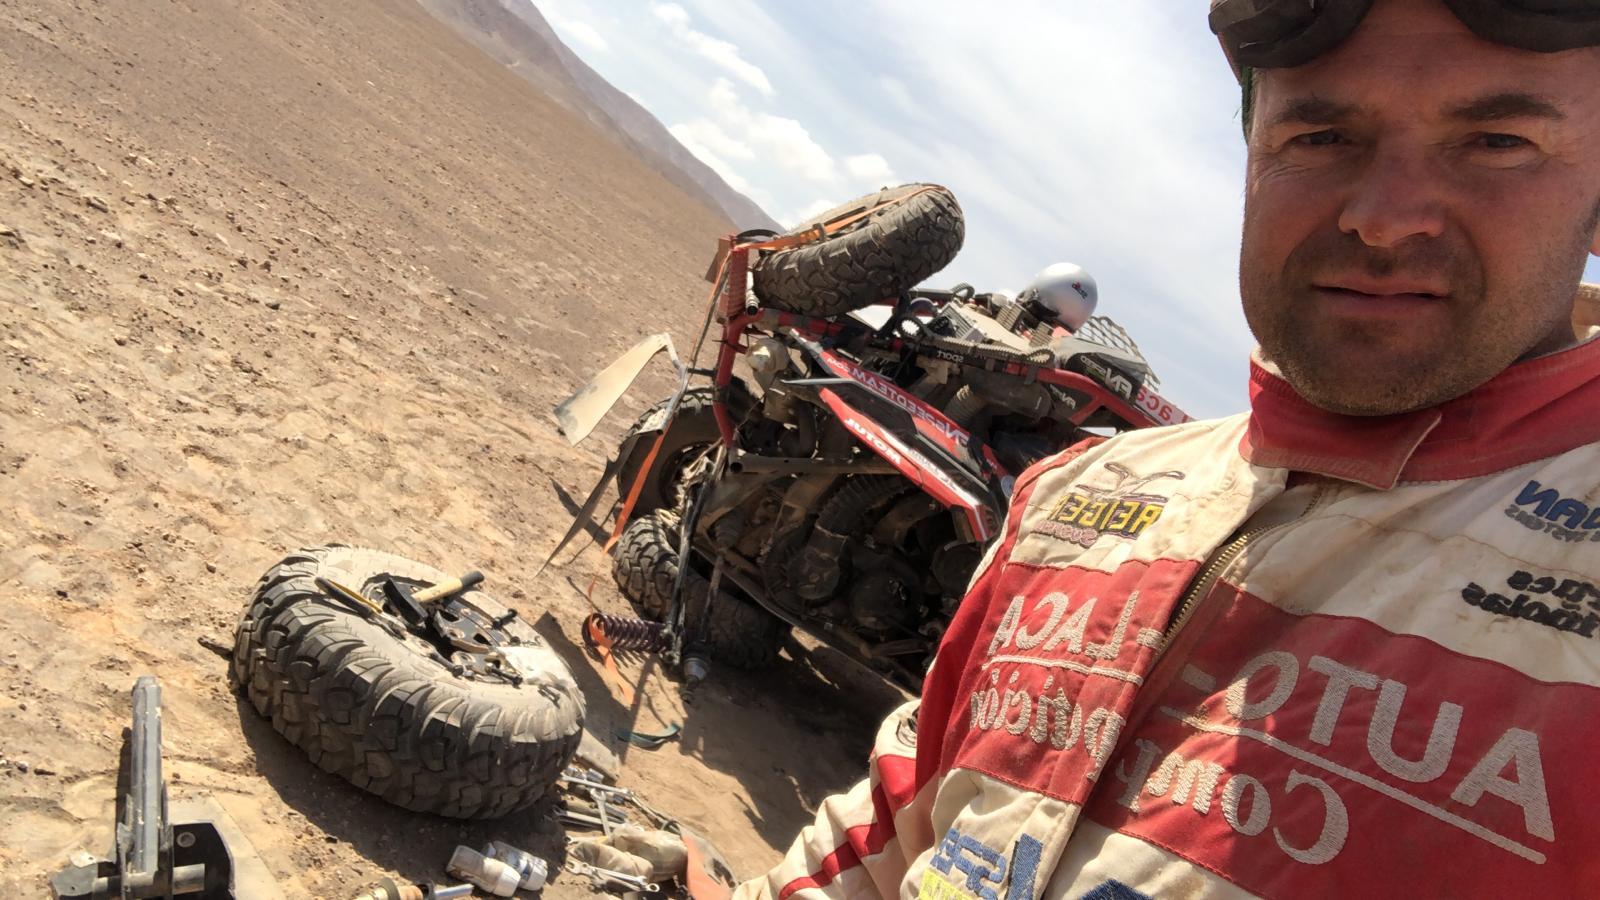 2019 41º Rallye Raid Dakar - Perú [6-17 Enero] - Página 7 Dwk3Fz6WkAEl3nN